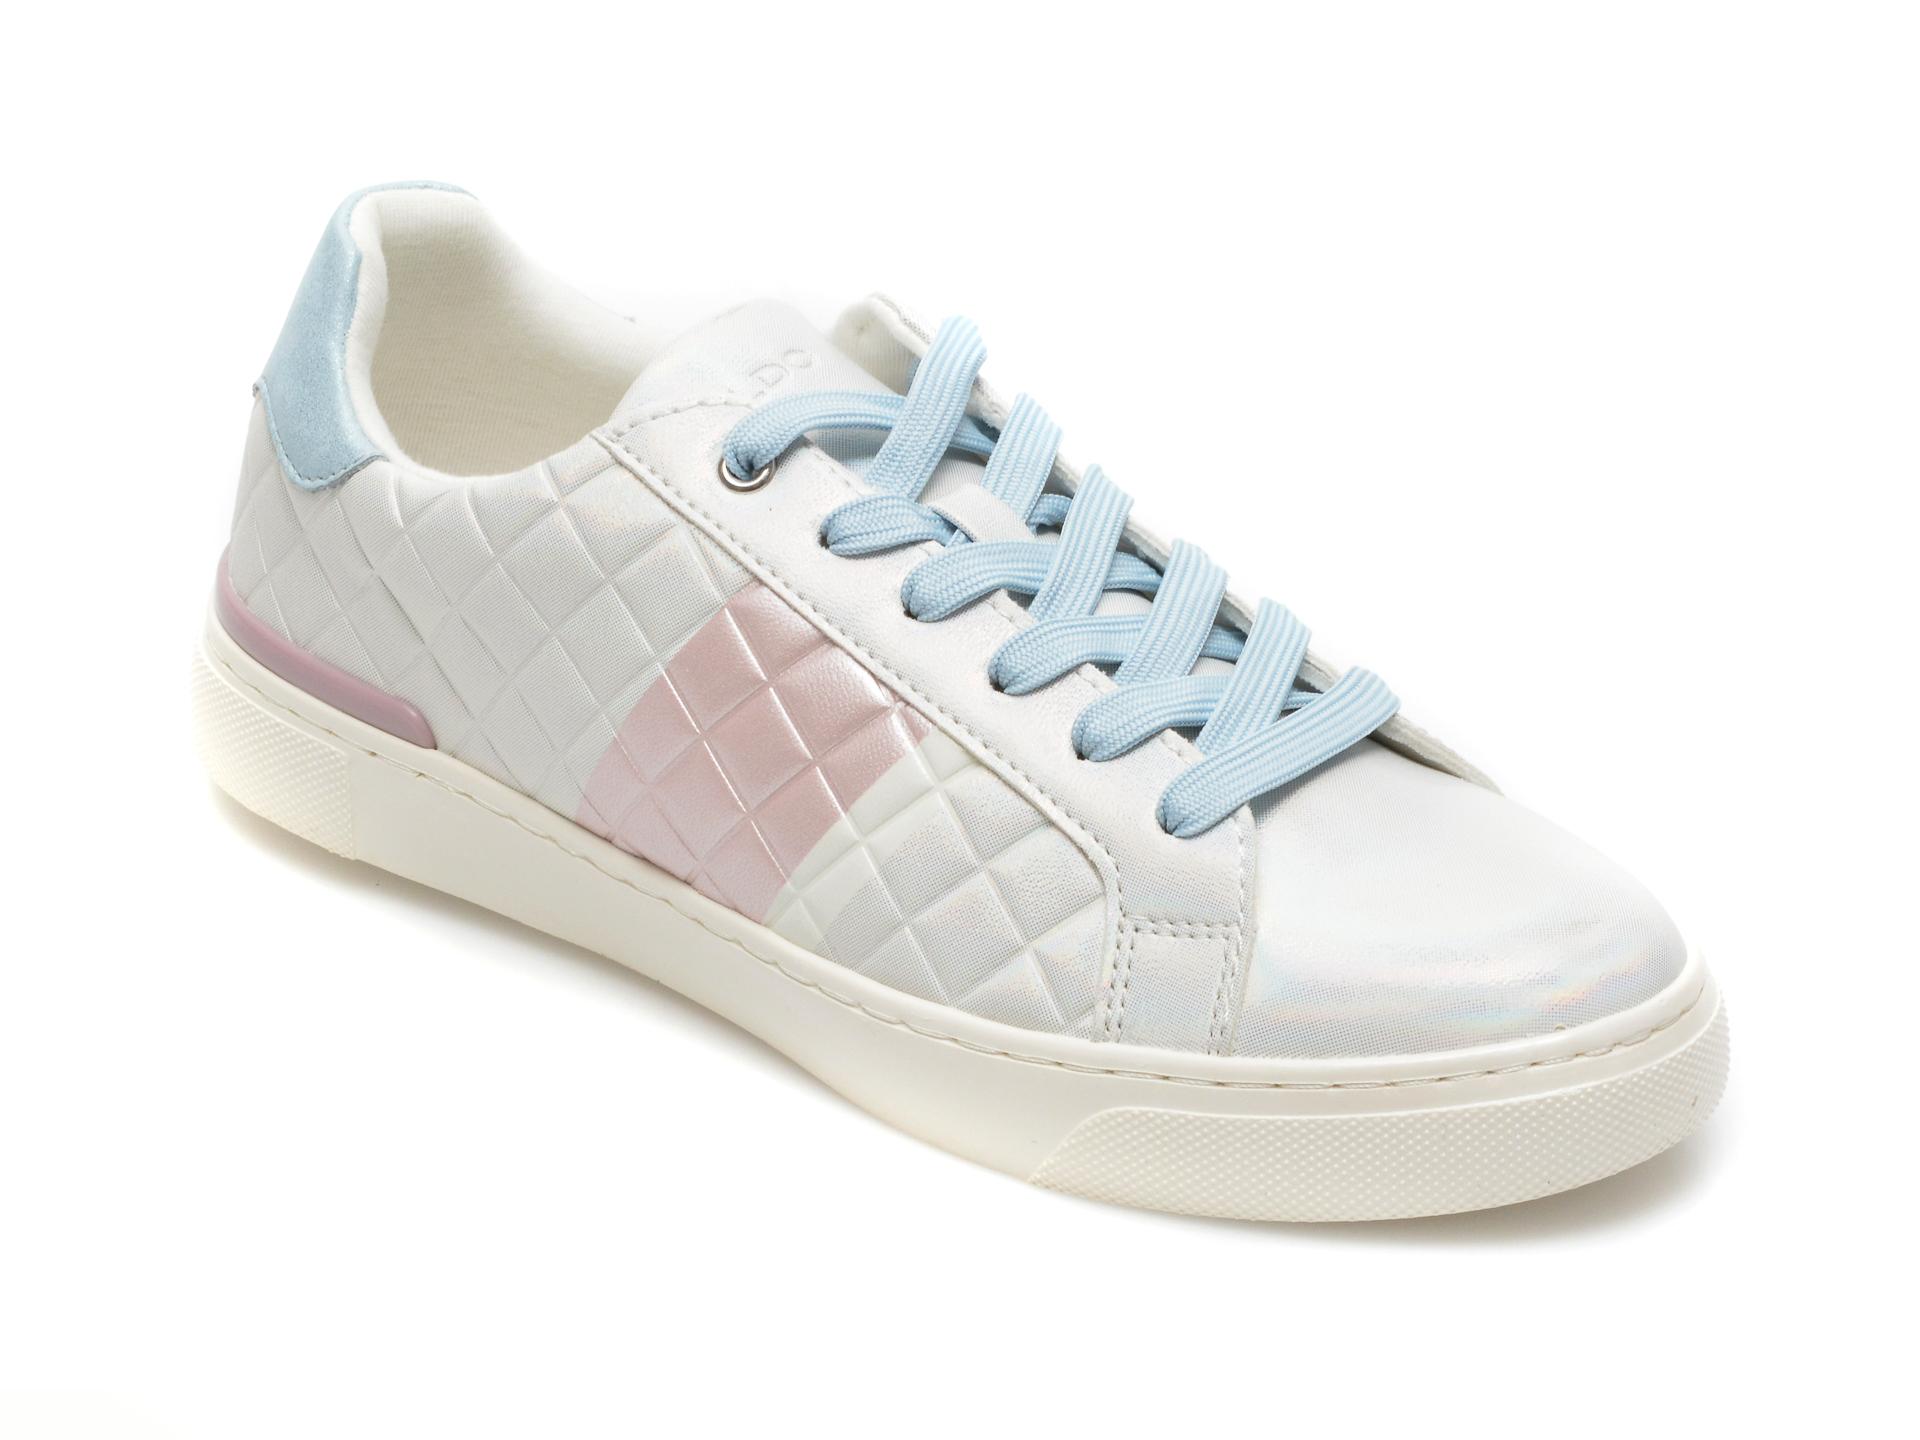 Pantofi Sport Aldo Albi, Lilito110, Din Piele Ecologica